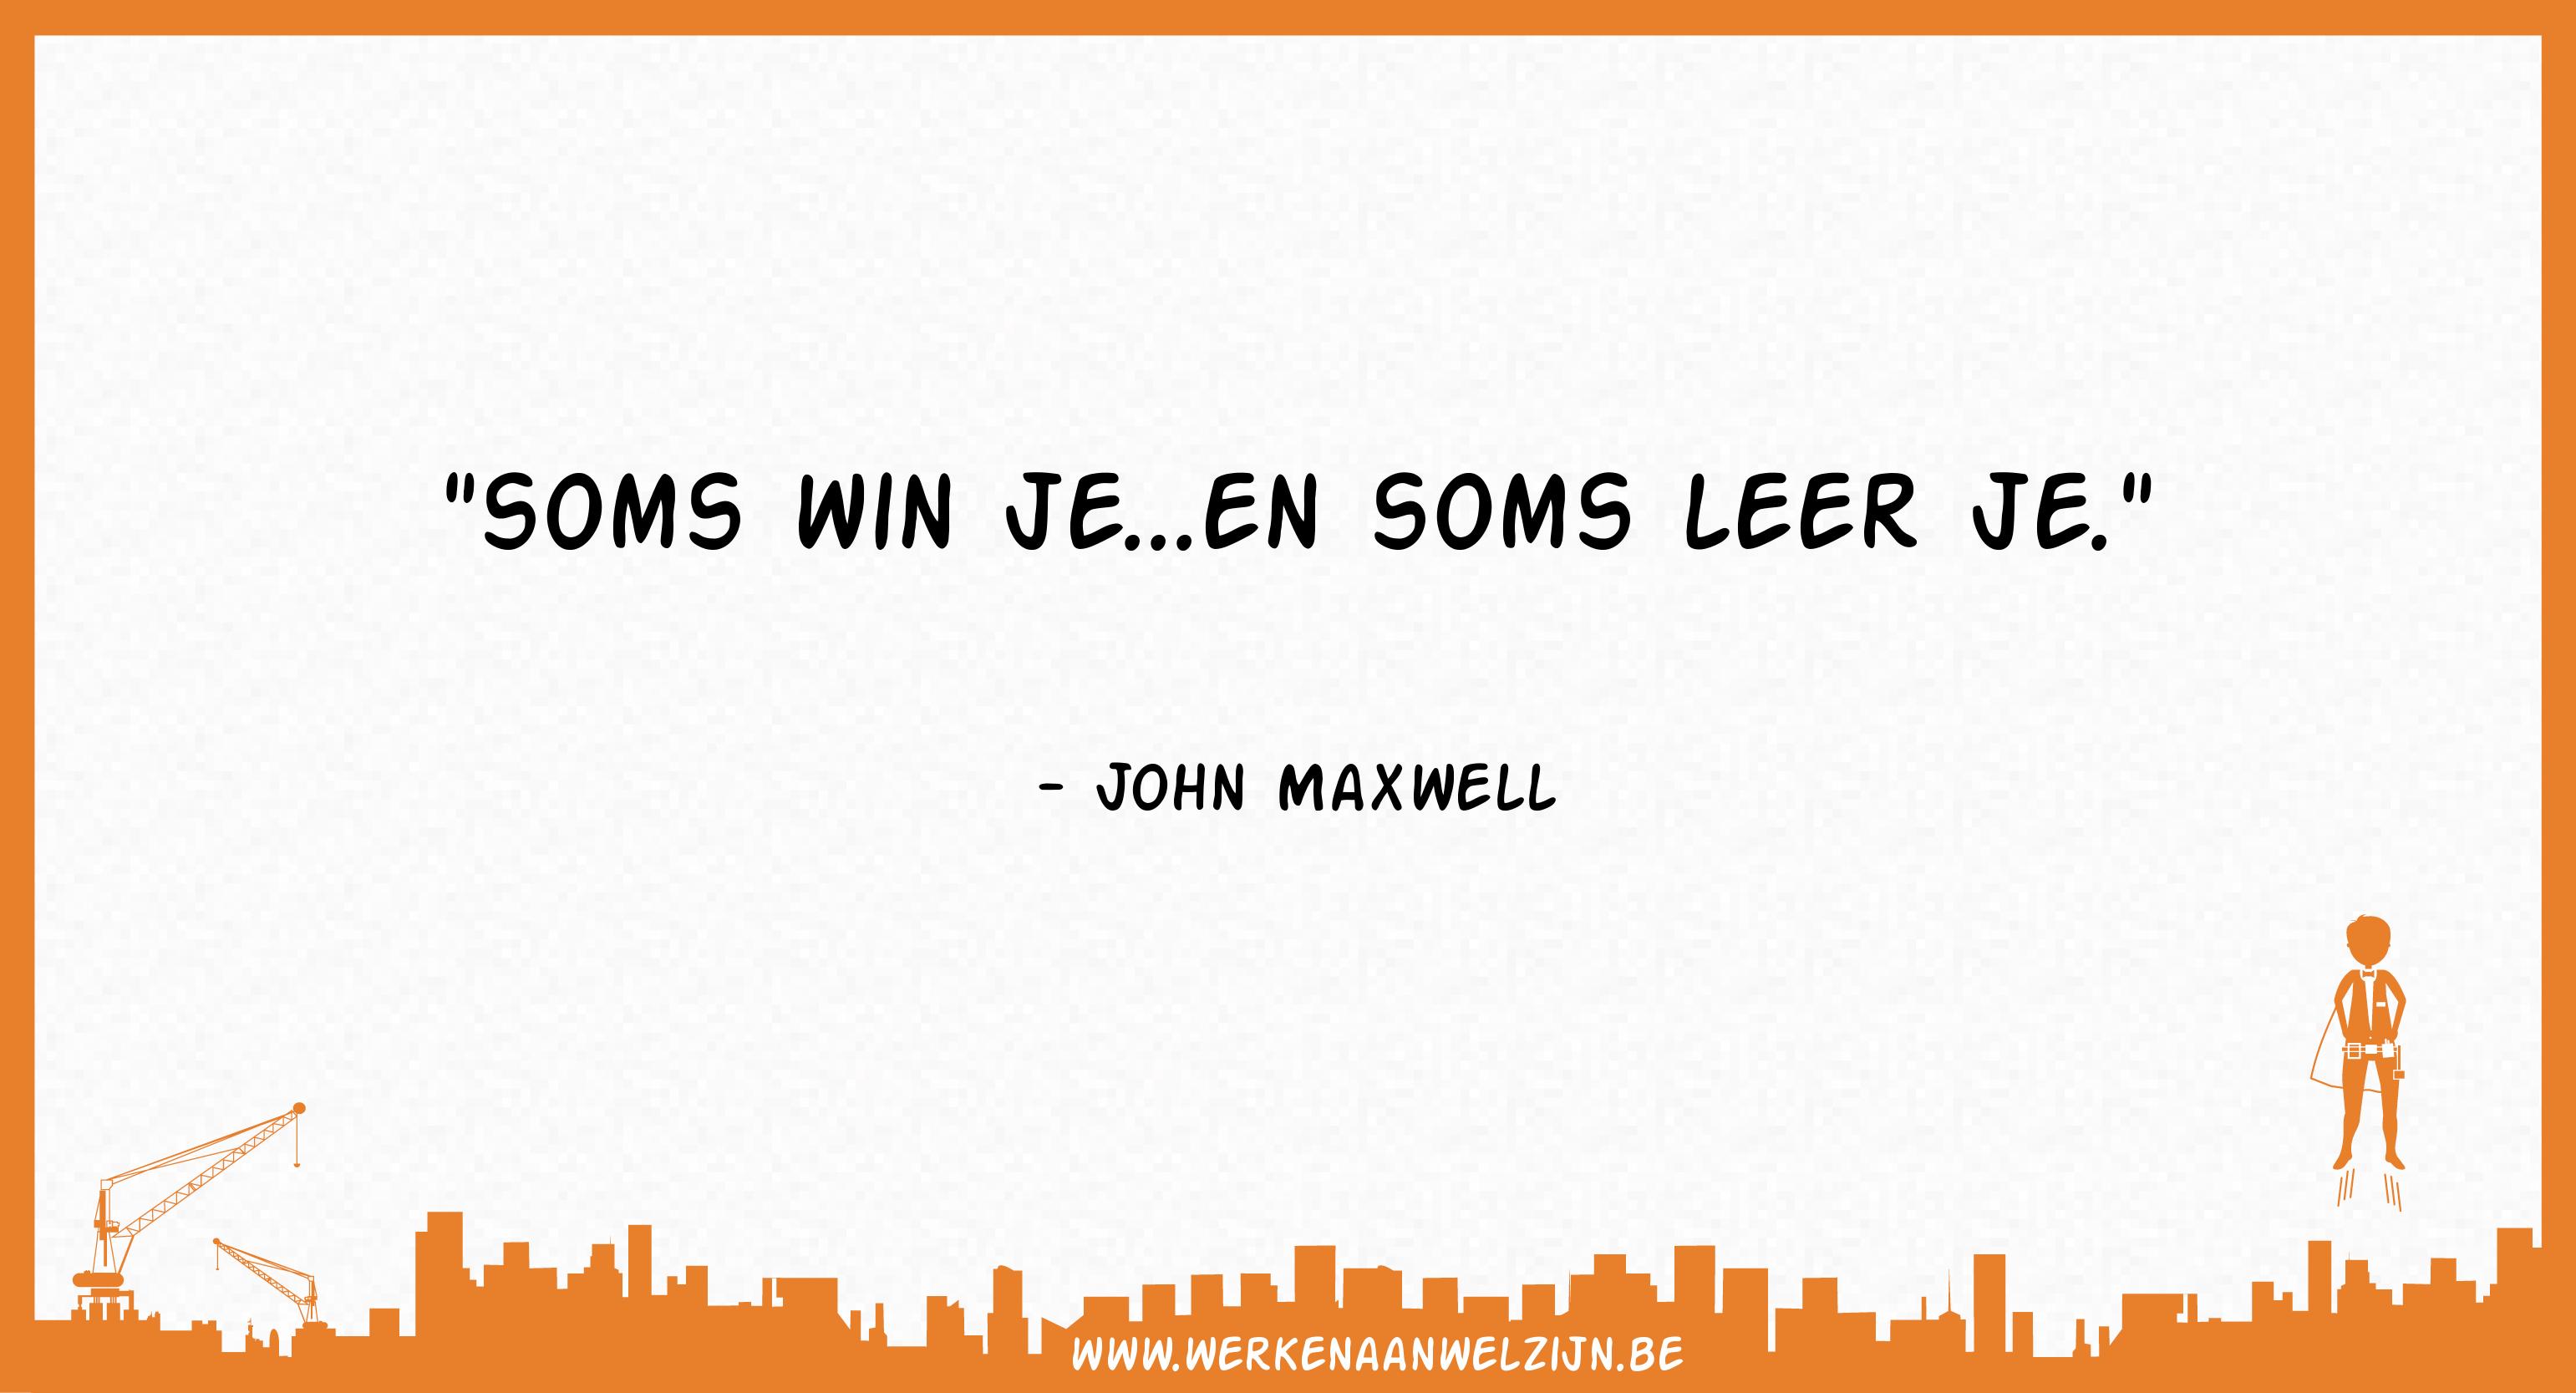 Soms win je... en soms leer je (John Maxwell)